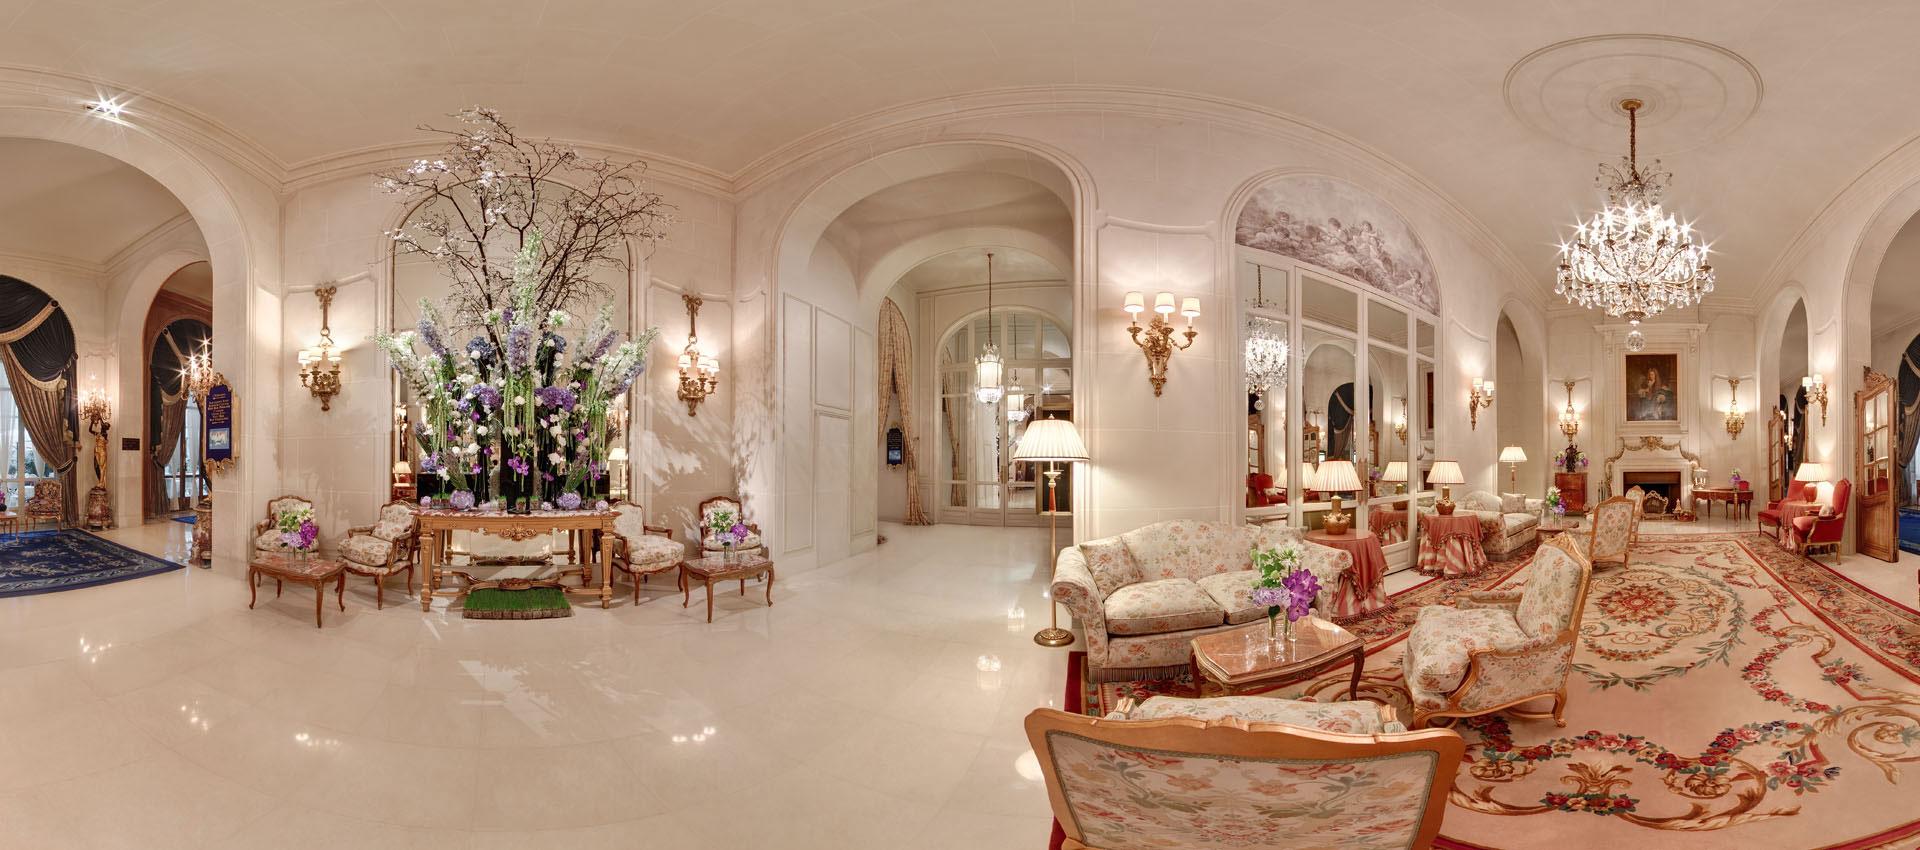 Grand Hotel Ric